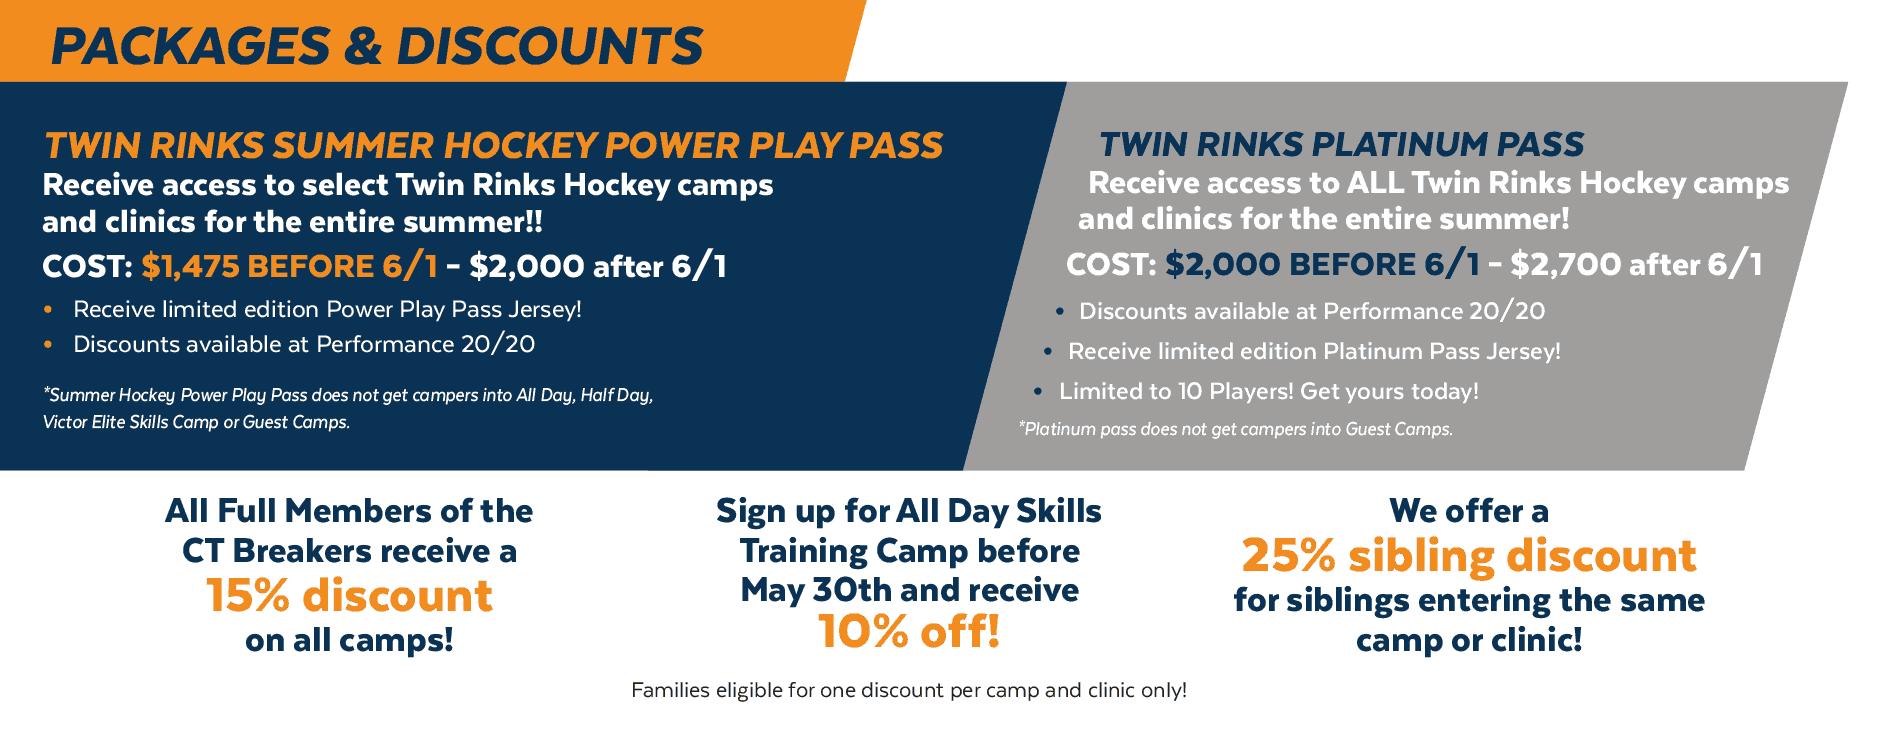 Twin Rinks Hockey Summer Camp Discounts